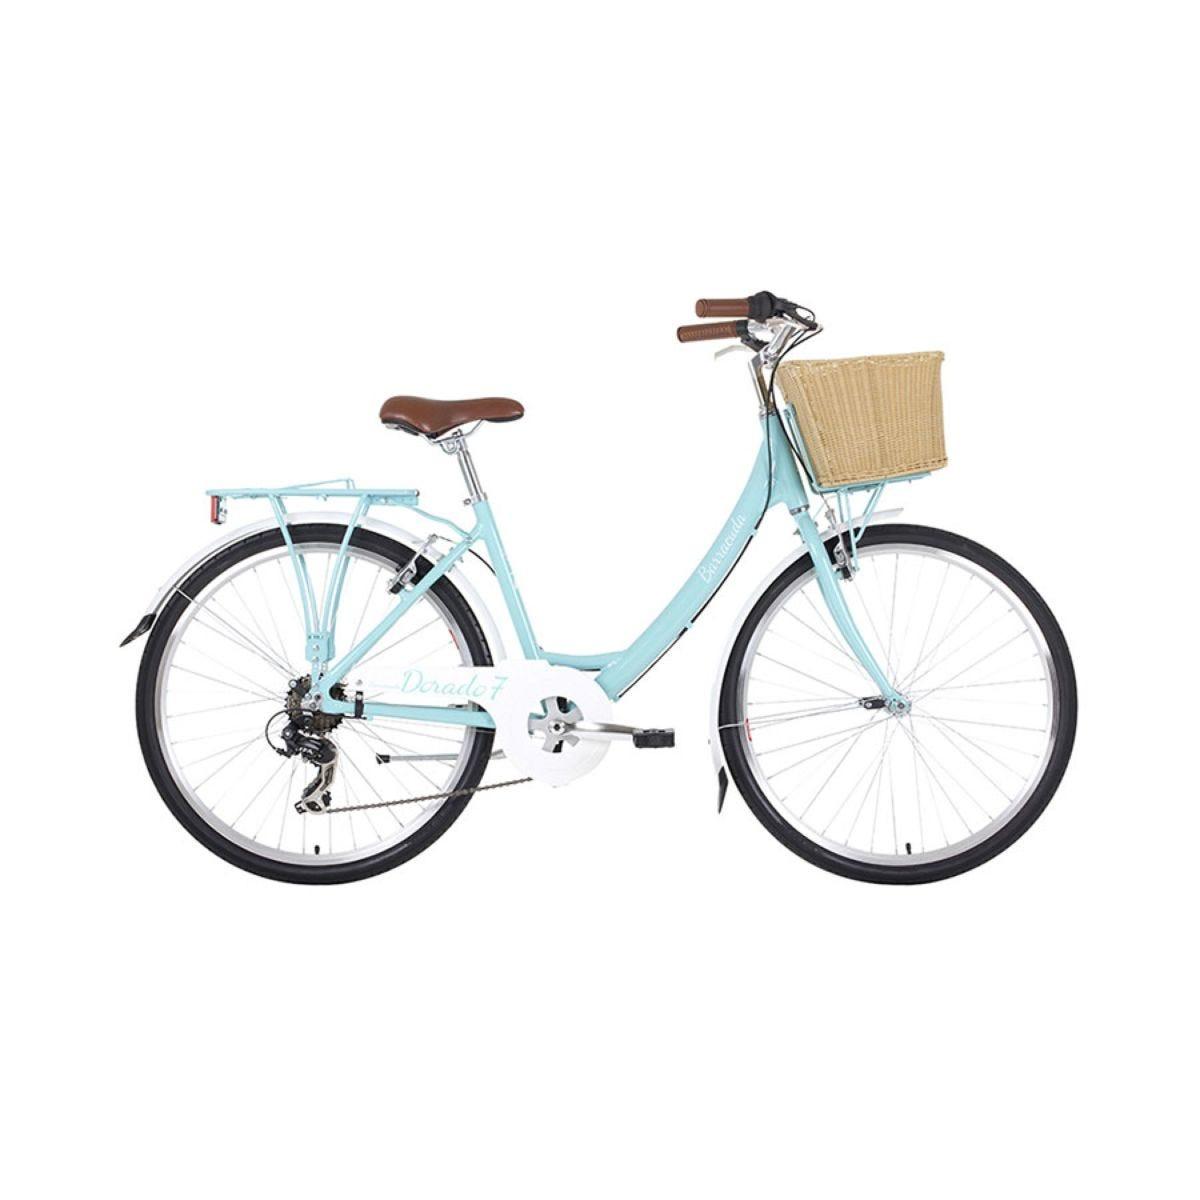 Barracuda Dorado 7 Woman's Commute Bike 26